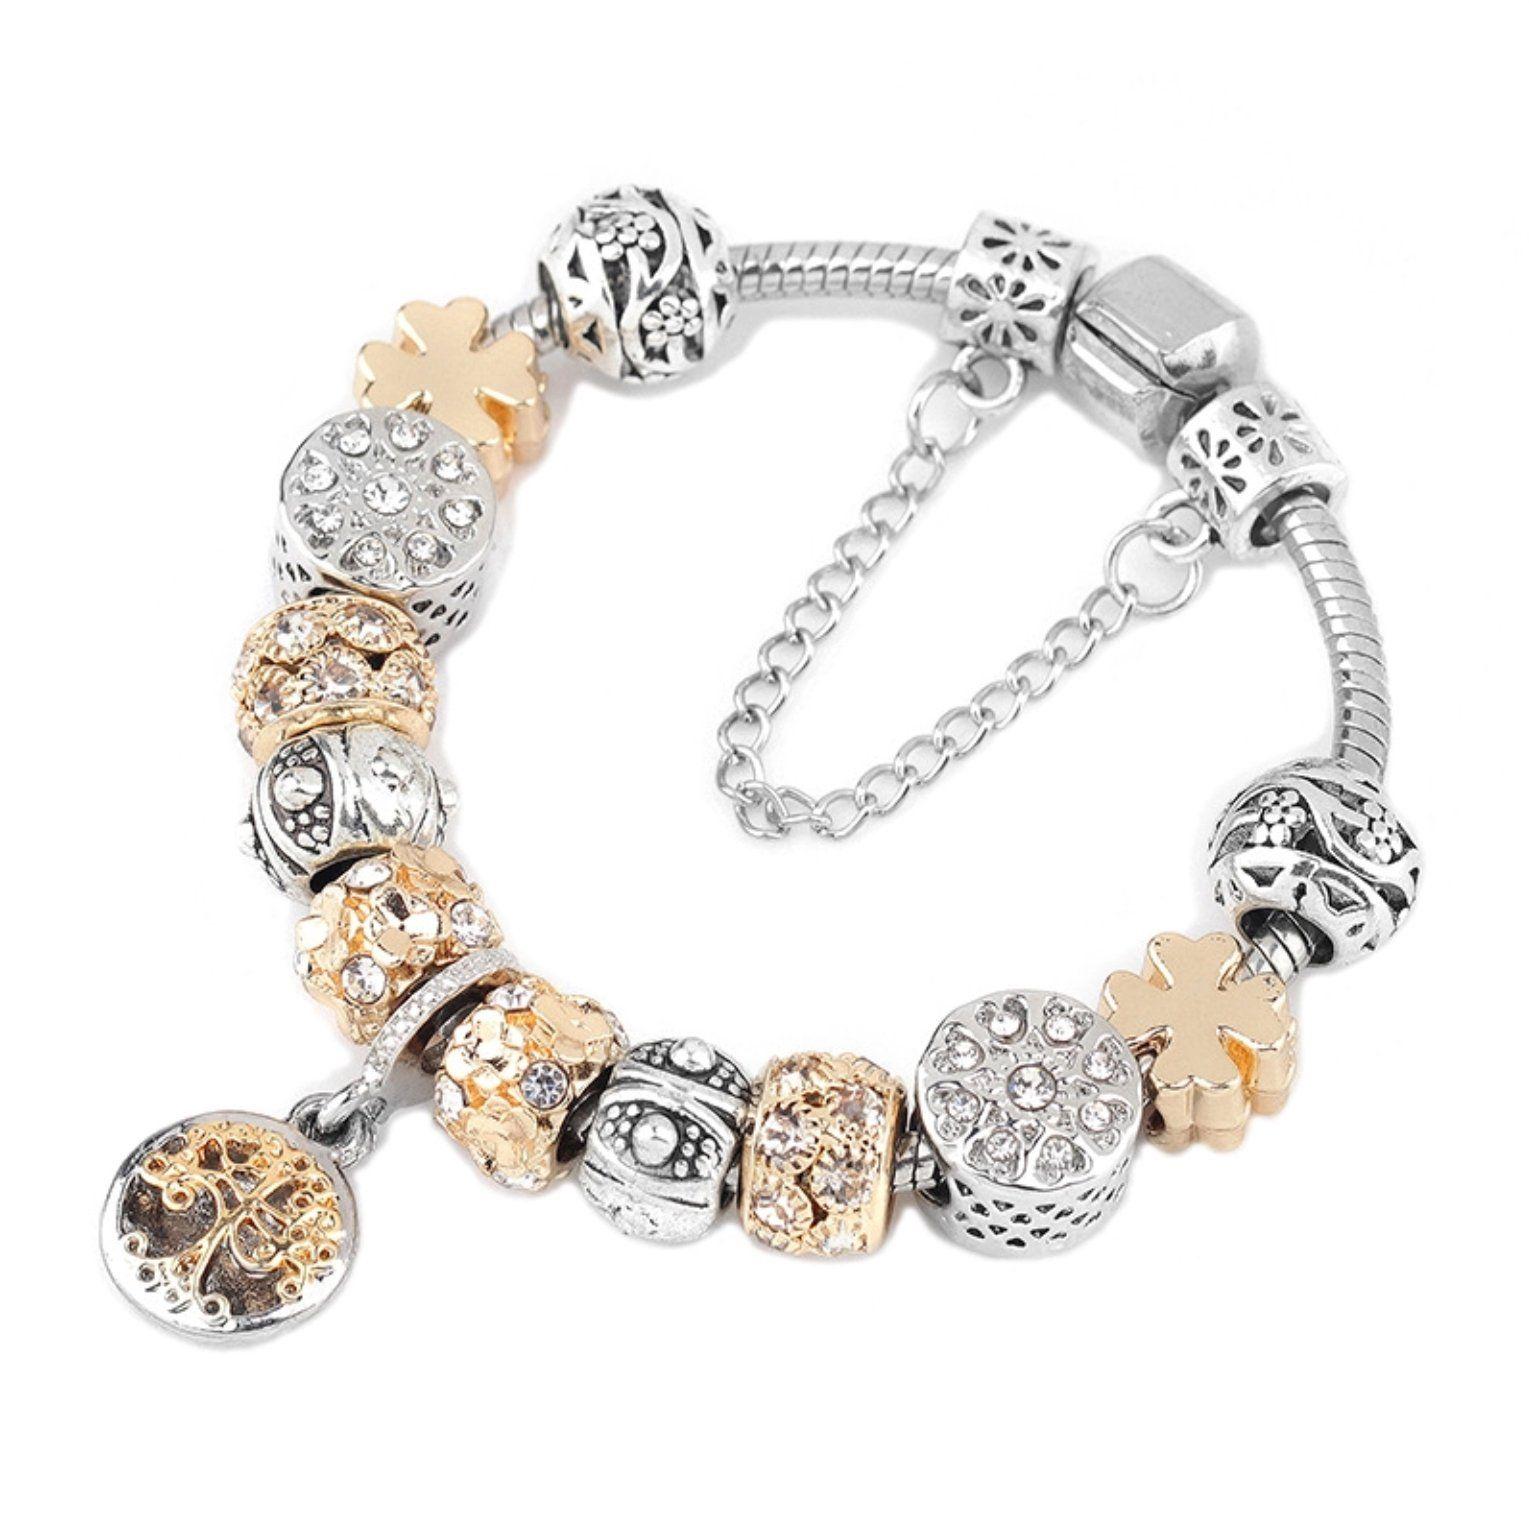 Family Tree Charm Bracelet Anyzul Charm Bracelet Silver Charms Silver Charm Bracelet